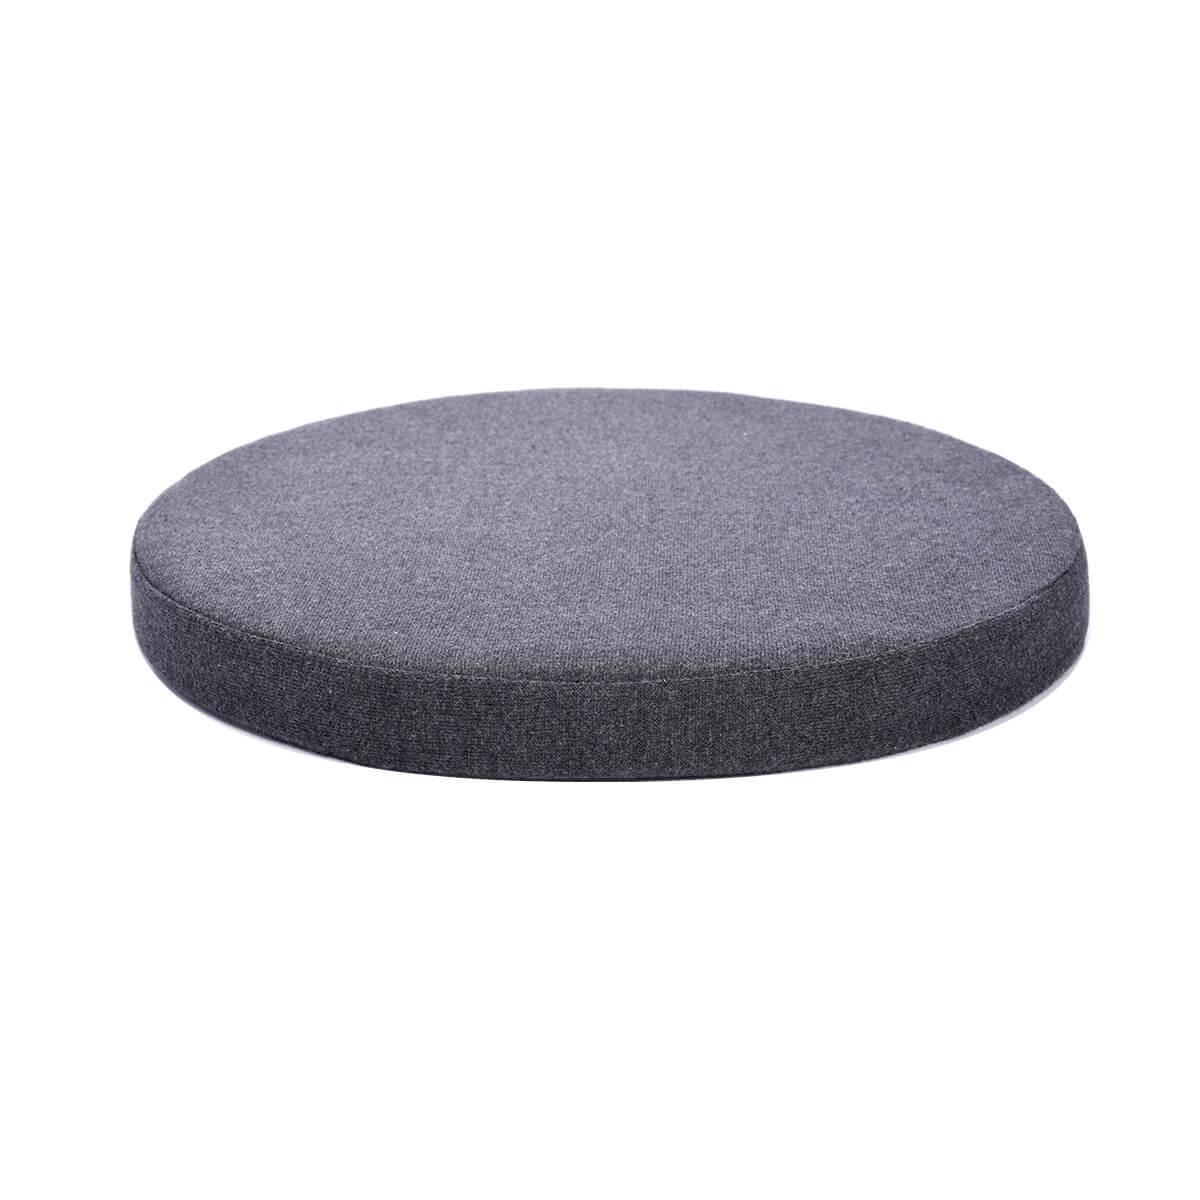 Jersey Cotton Round Seat Cushion